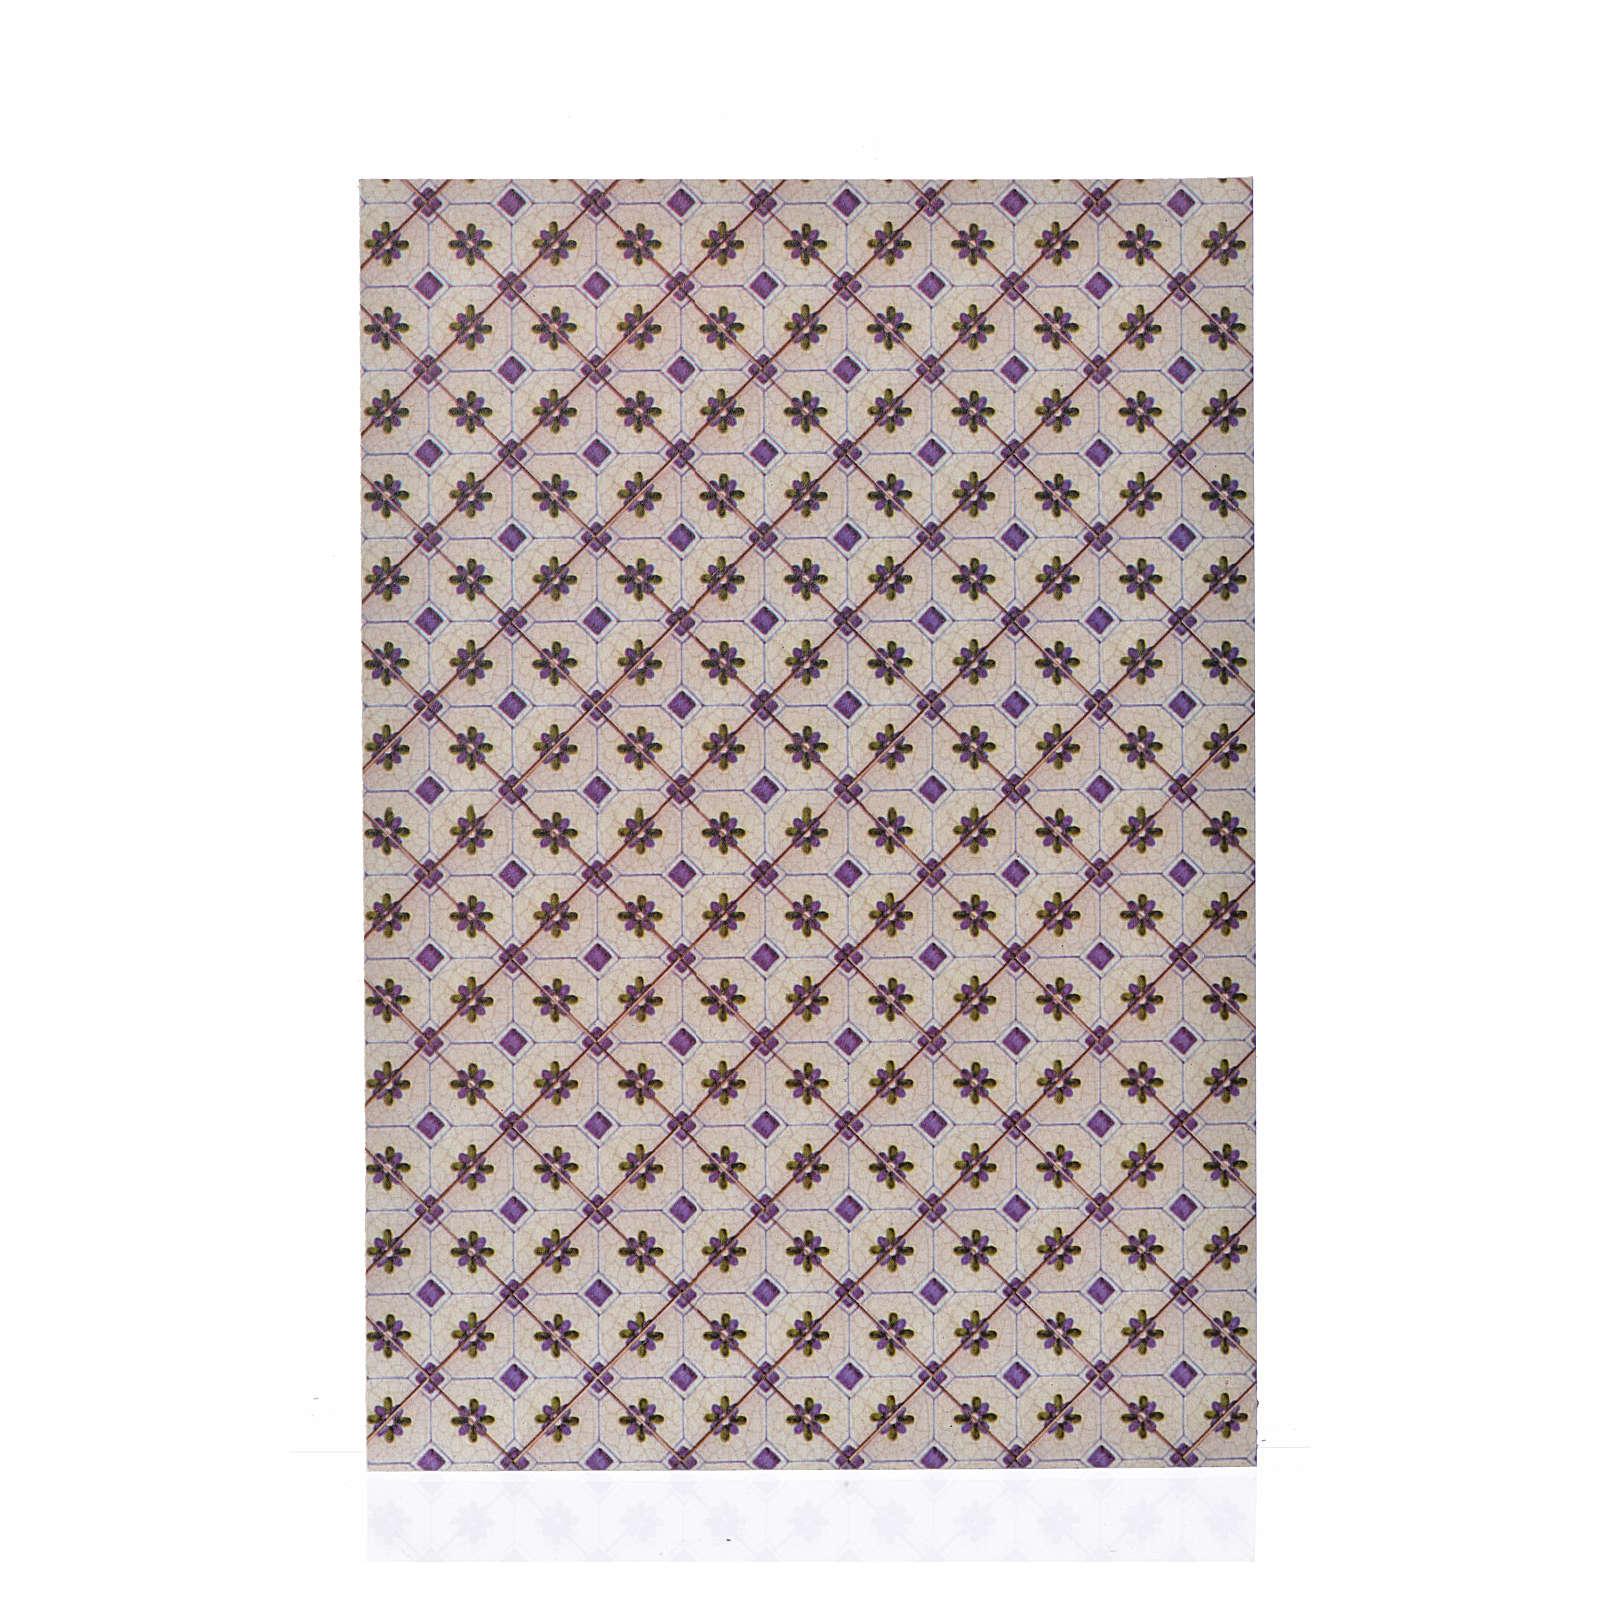 Cartoncino sottile pavimento rombi 24X16,5 cm 4